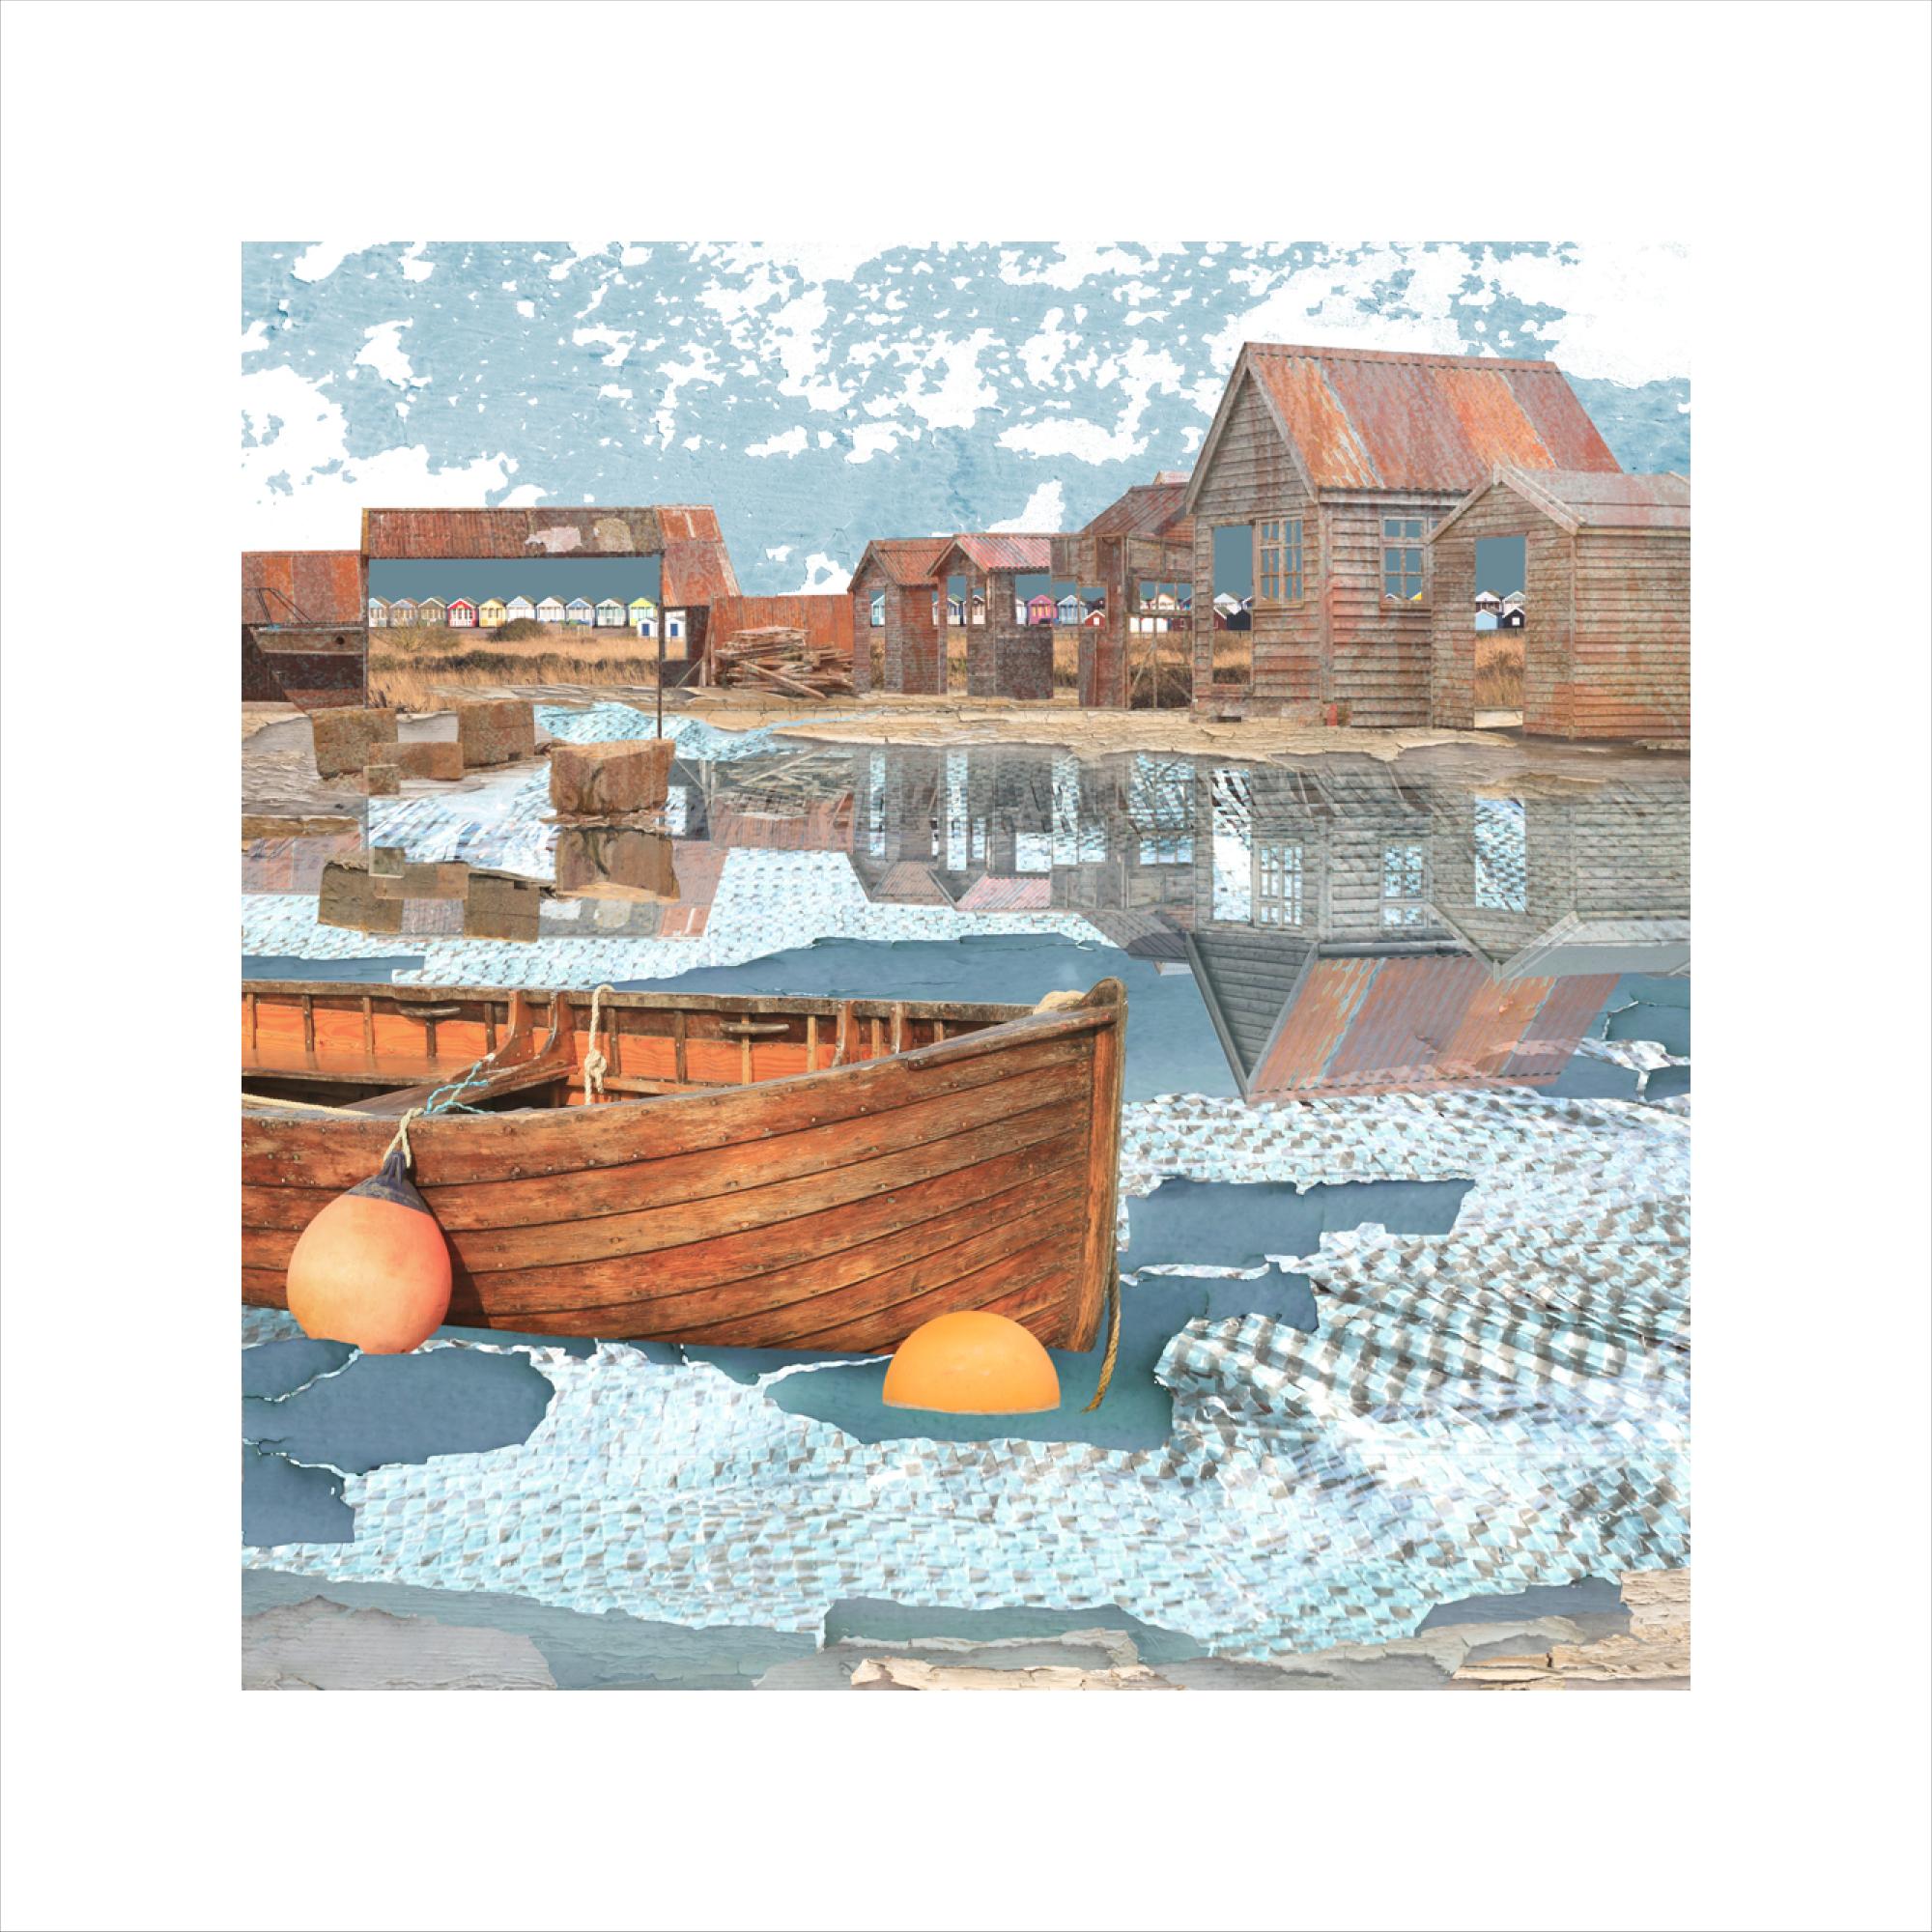 Claire Gill, Artist Seacsape 65 limited edition print, limited edition print, buy art, seascapes, coastal art, digital photomontage, Southwold